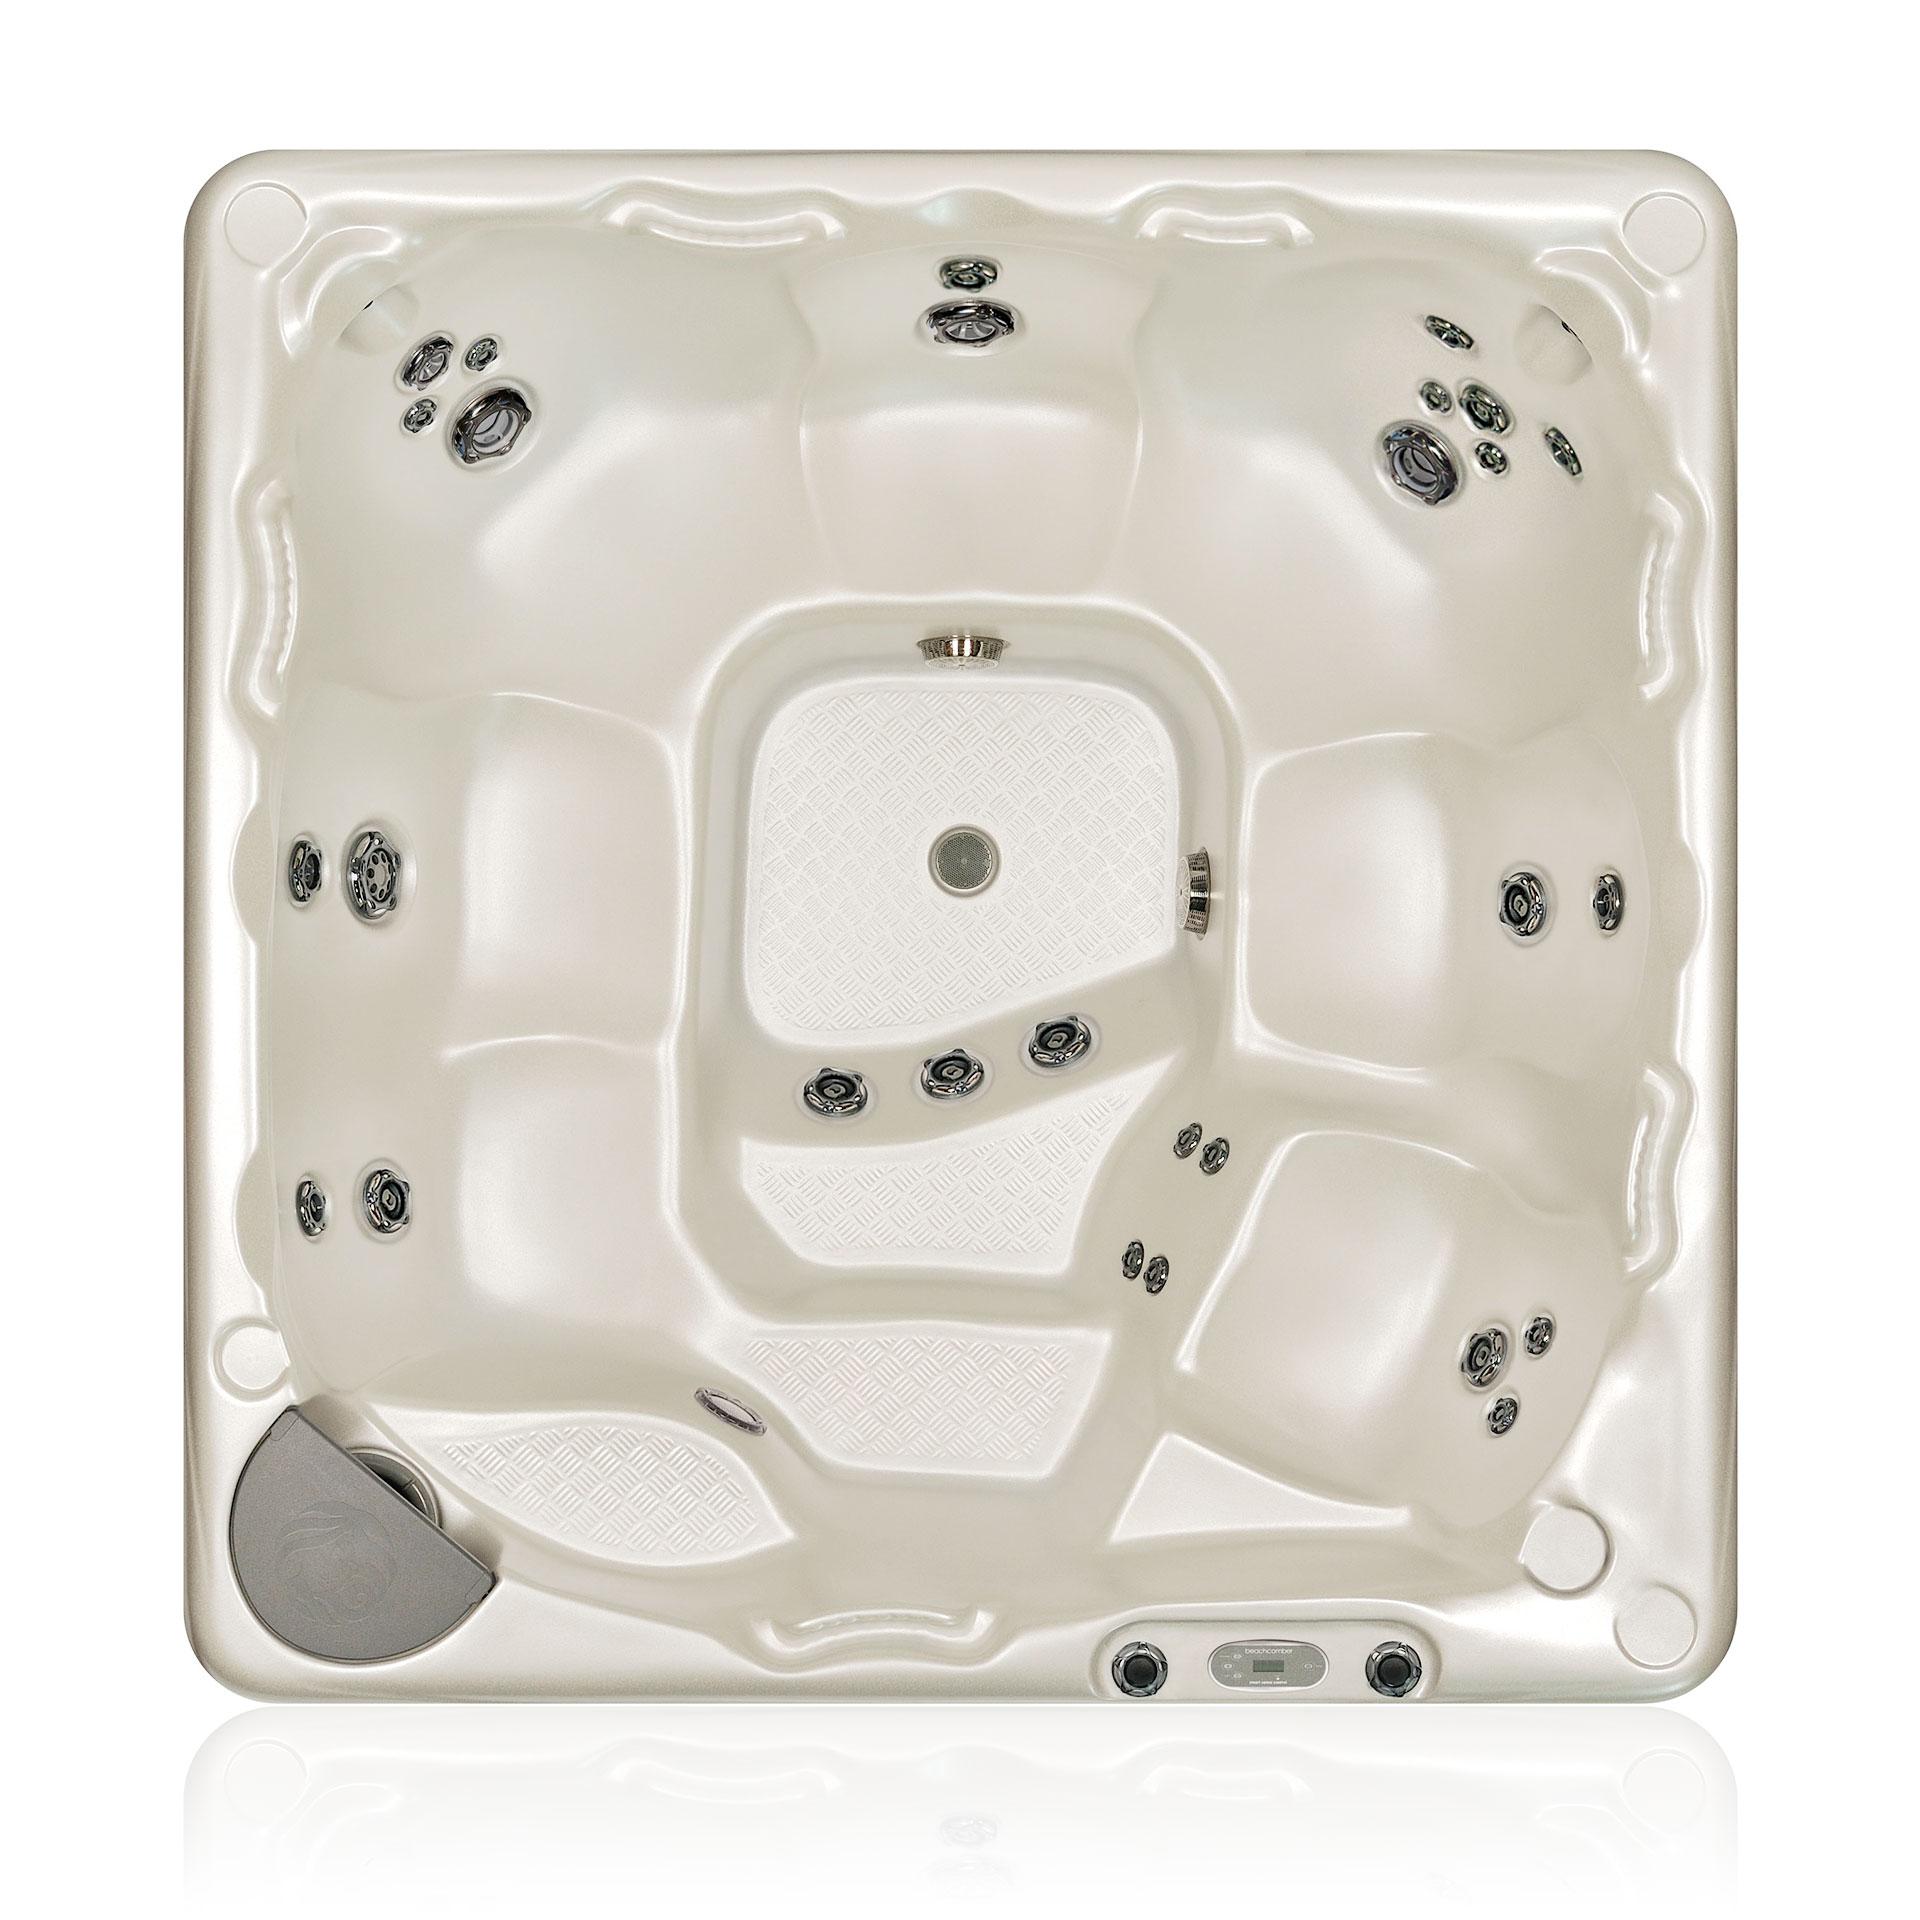 BC Home Leisure Langley 500 Series Beachcomber Hot Tub